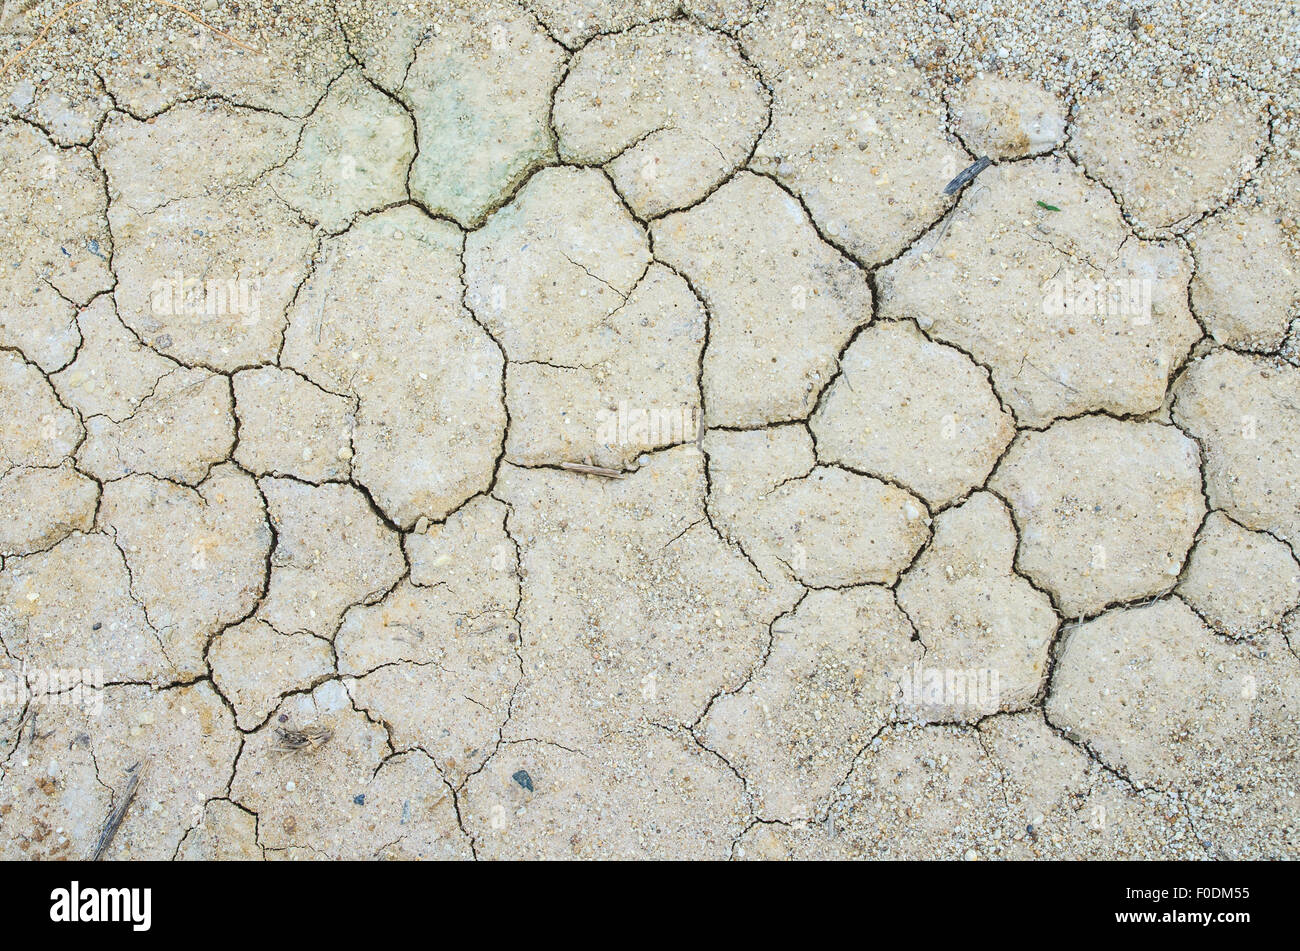 Cracked Ground, Earthquake Background, Texture - Stock Image